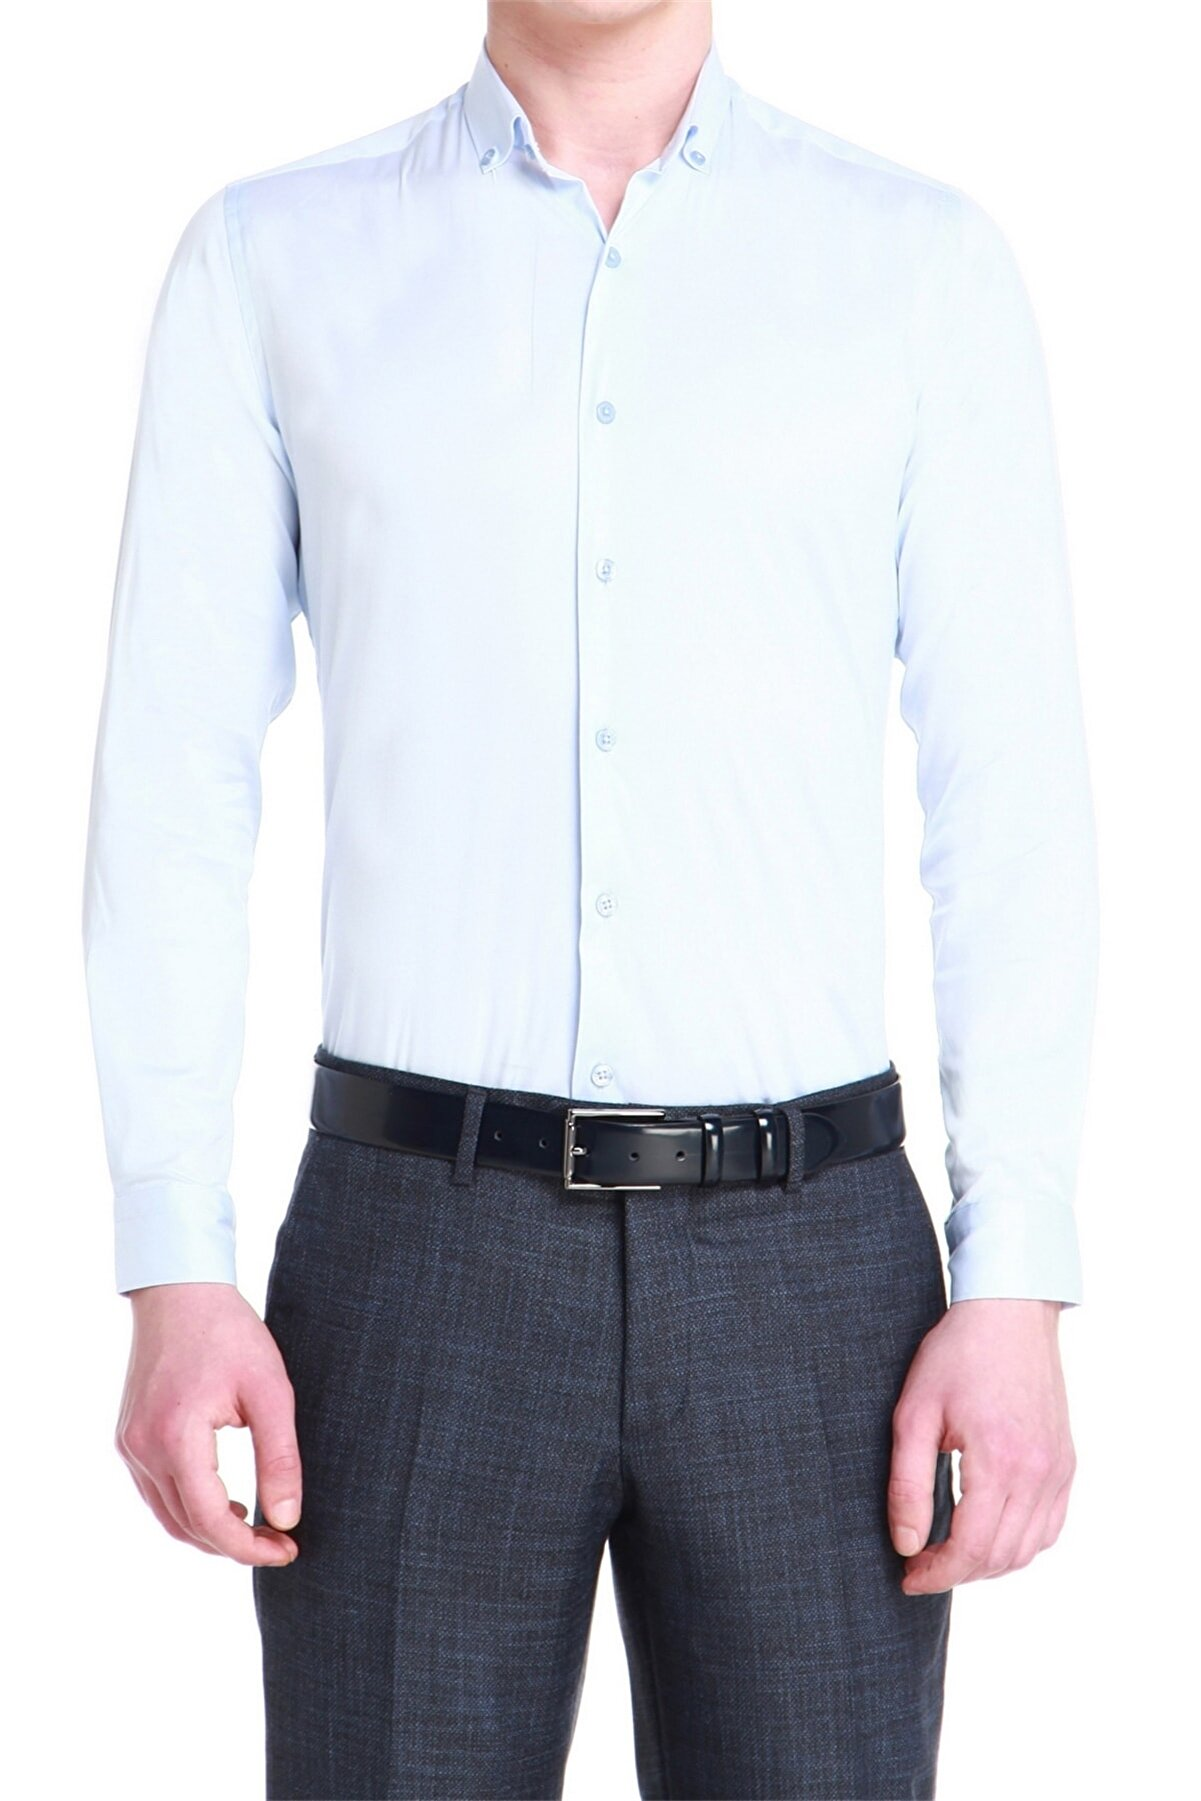 Efor Gk 536 Slim Fit Açık Mavi Klasik Gömlek